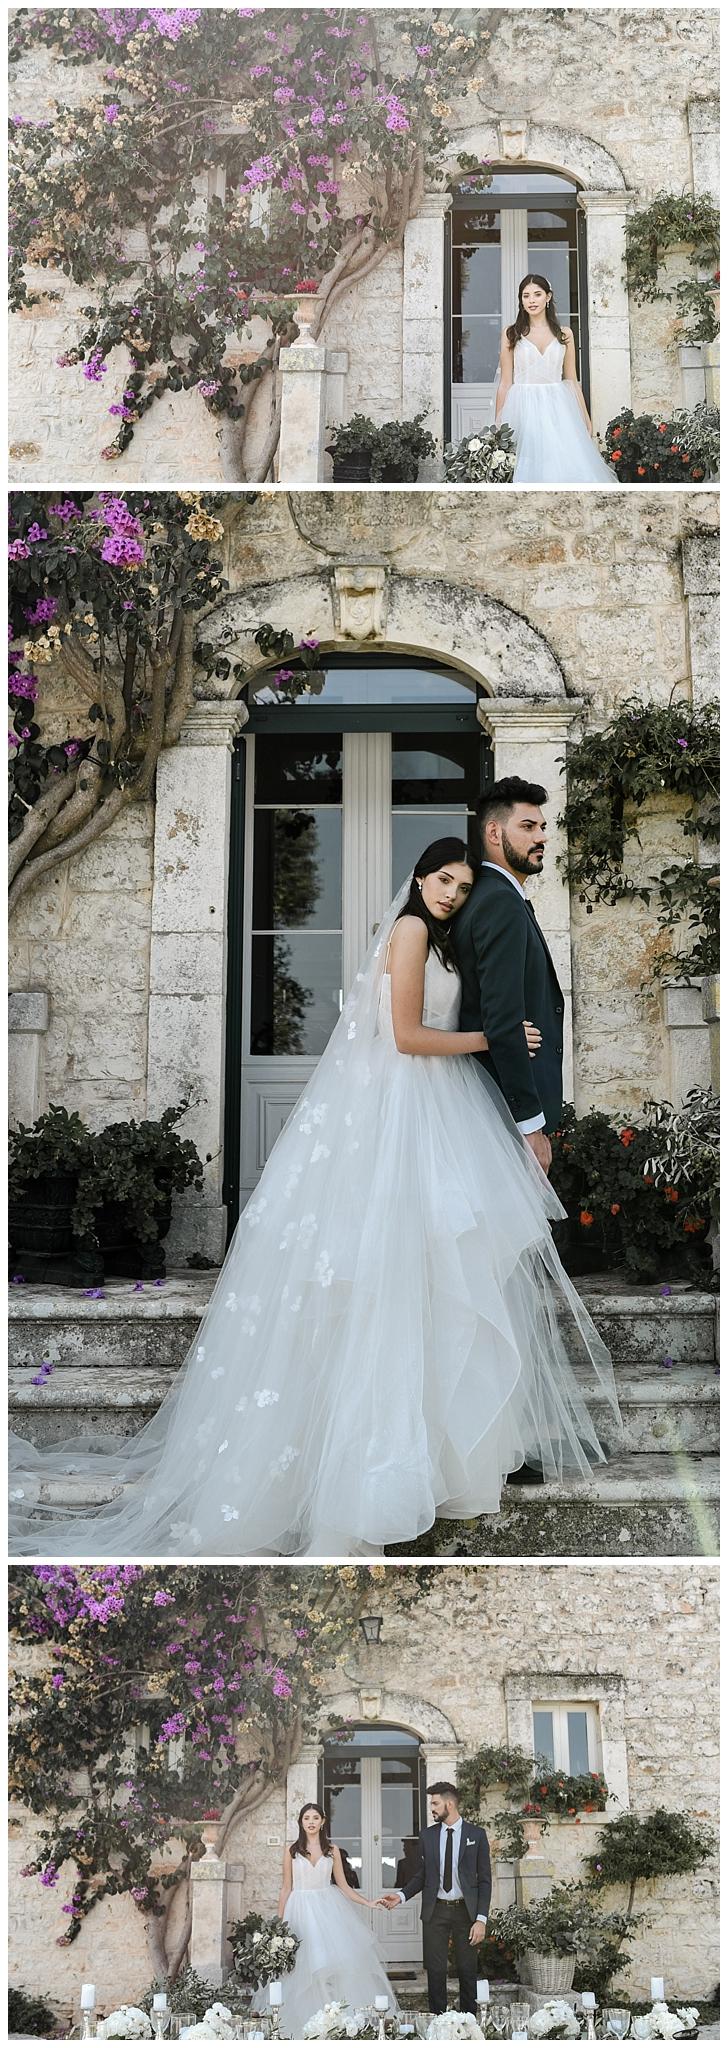 Puglia-Tara-Florence-Bridal-Editorial-136_WEB.jpg